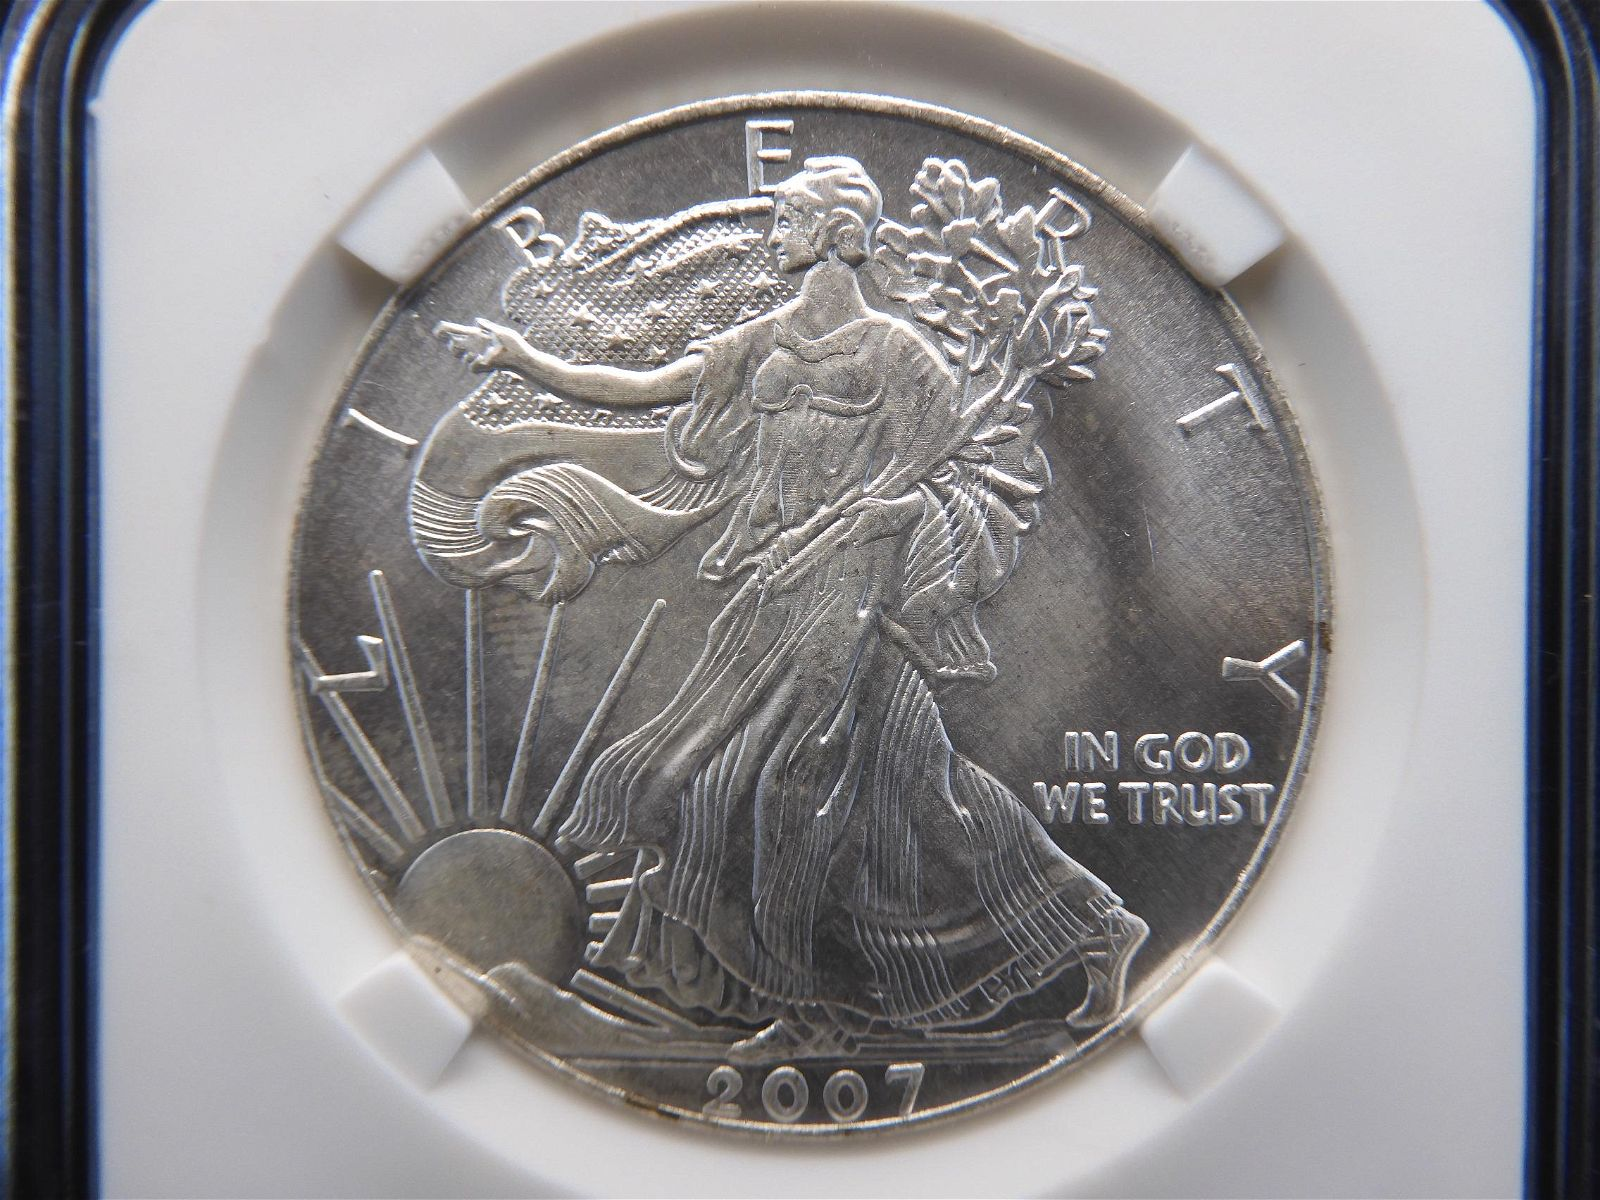 2007 American Silver Eagle .1 Troy oz .999 Fine Silver